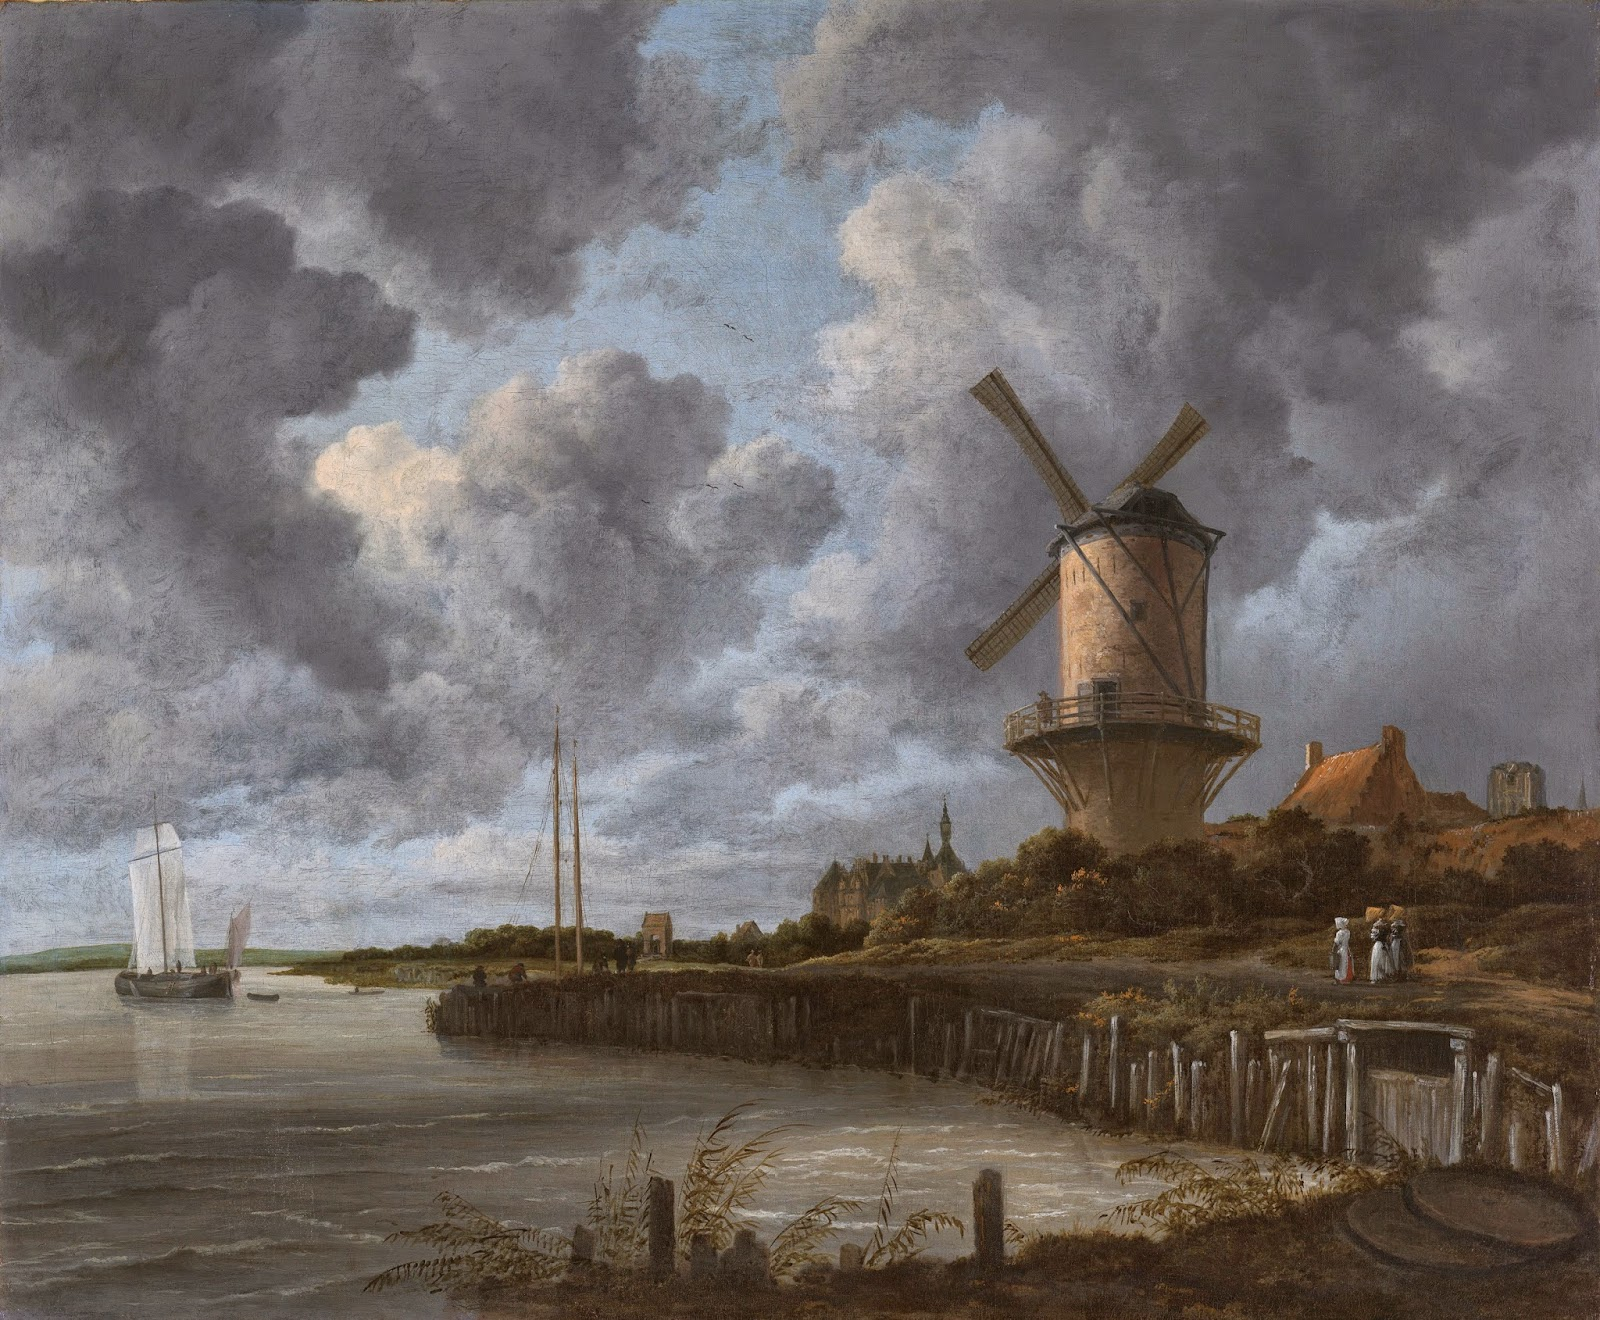 il mulino a vento a Wijk-bij-Duurstede